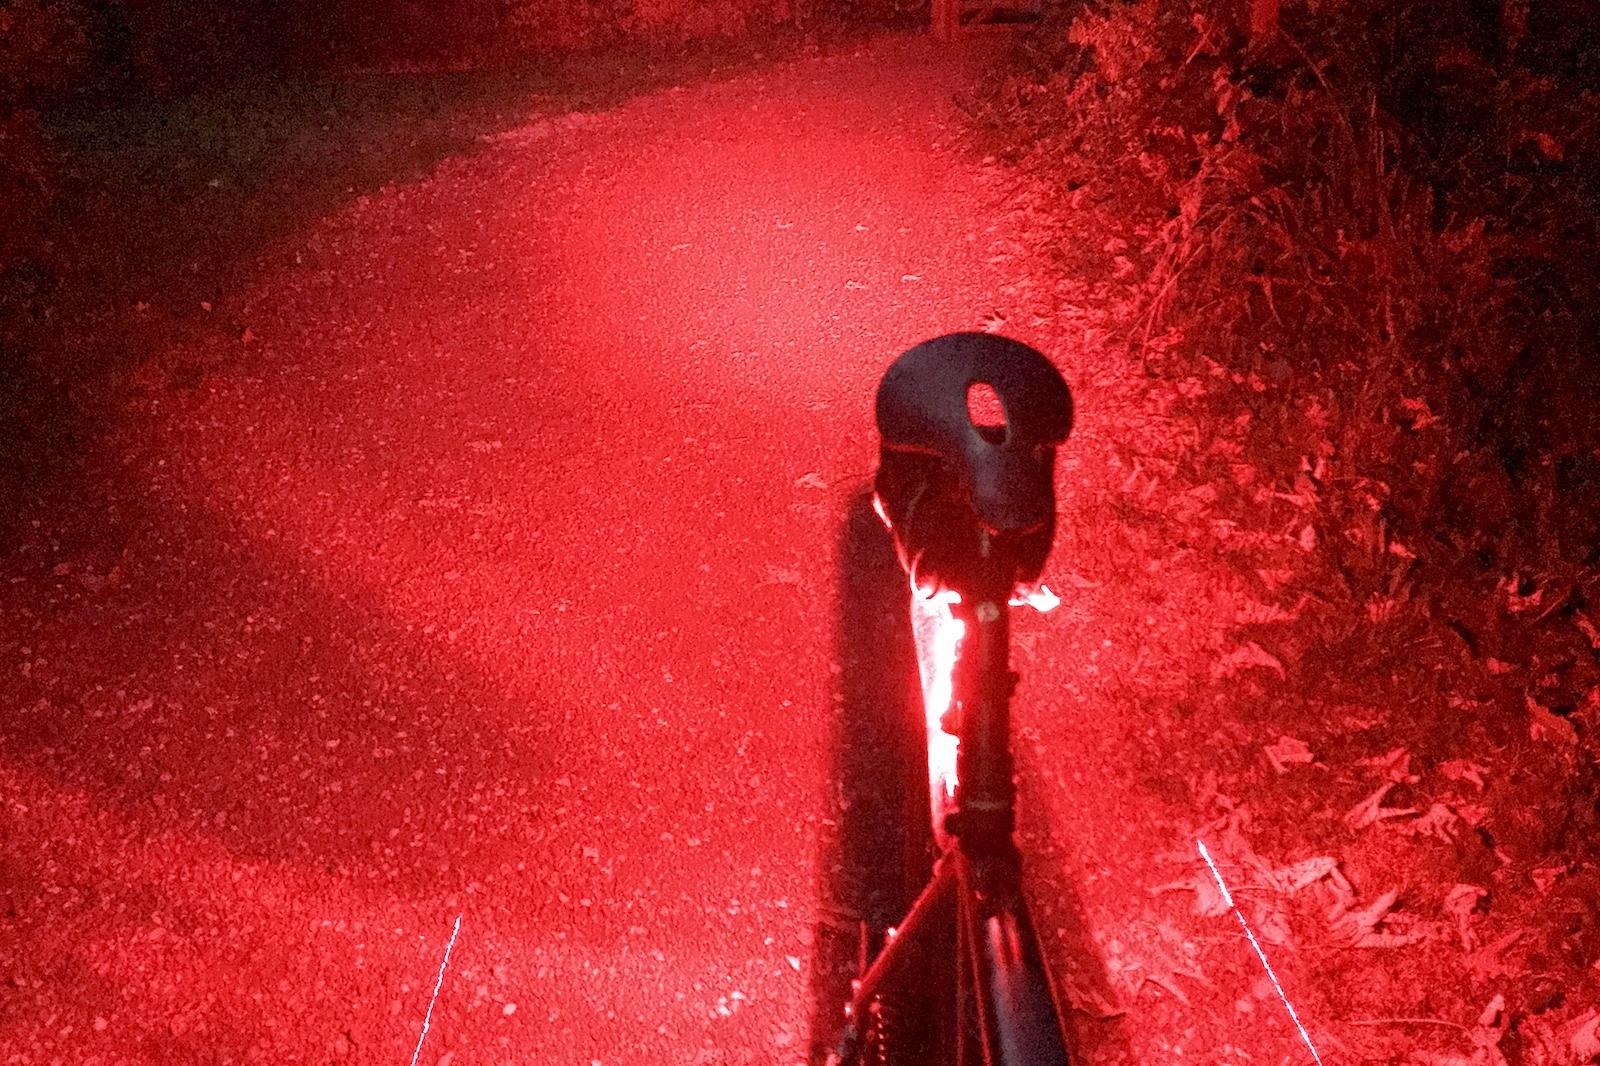 NiteRider Sentinel 250 Rear Bike Light